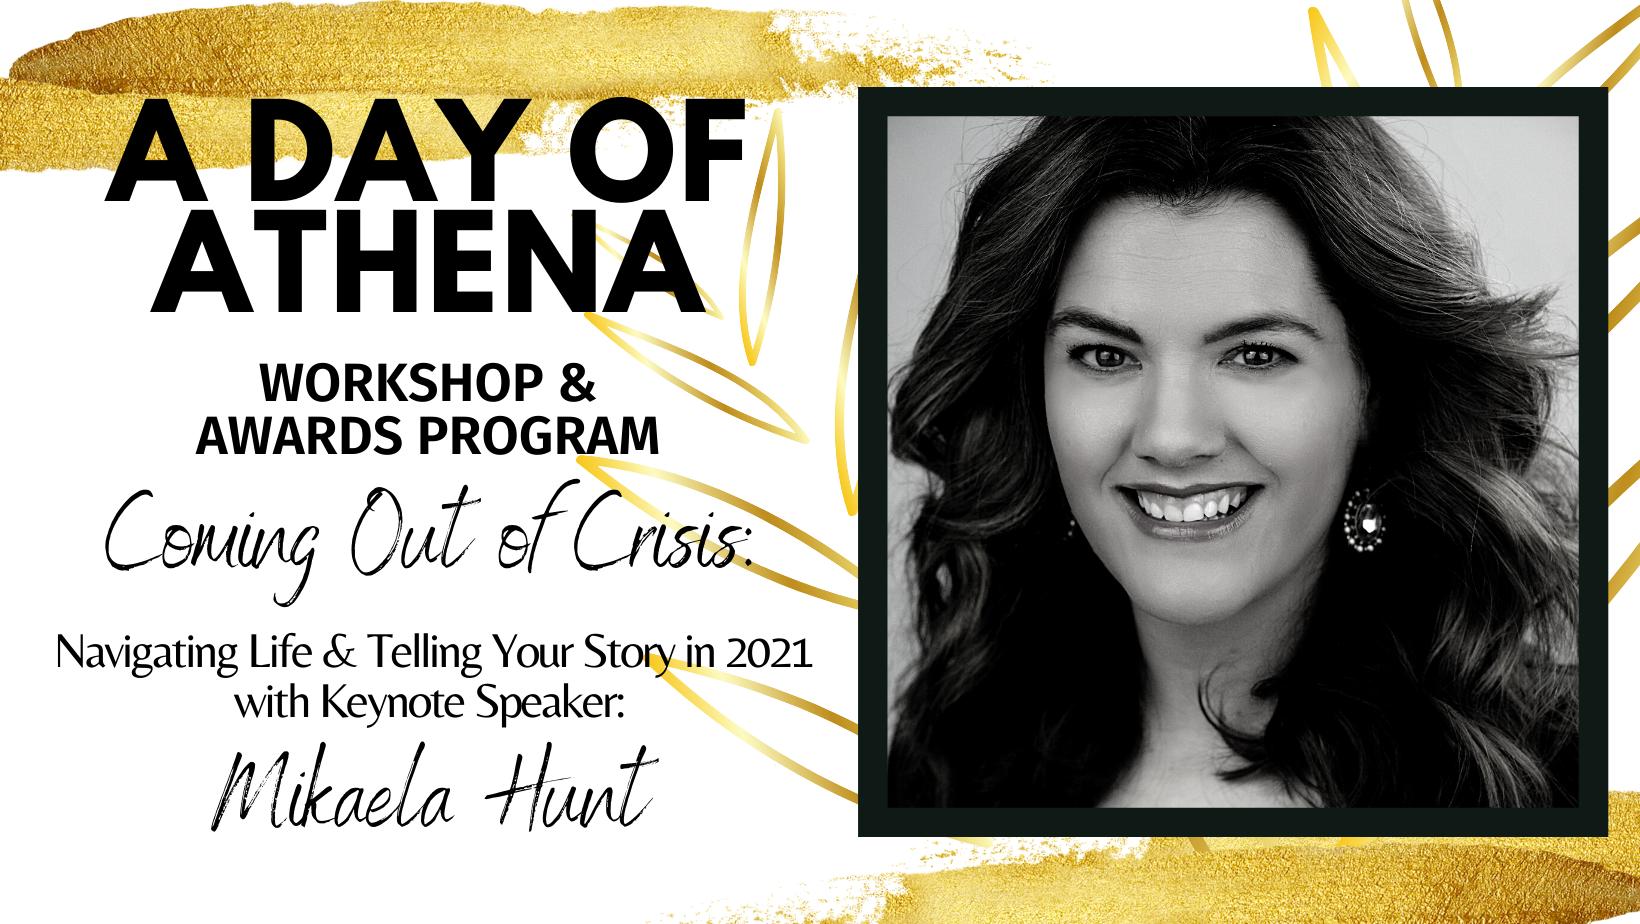 2021 A Day of ATHENA Workshop and Awards Program - Mikaela Hunt